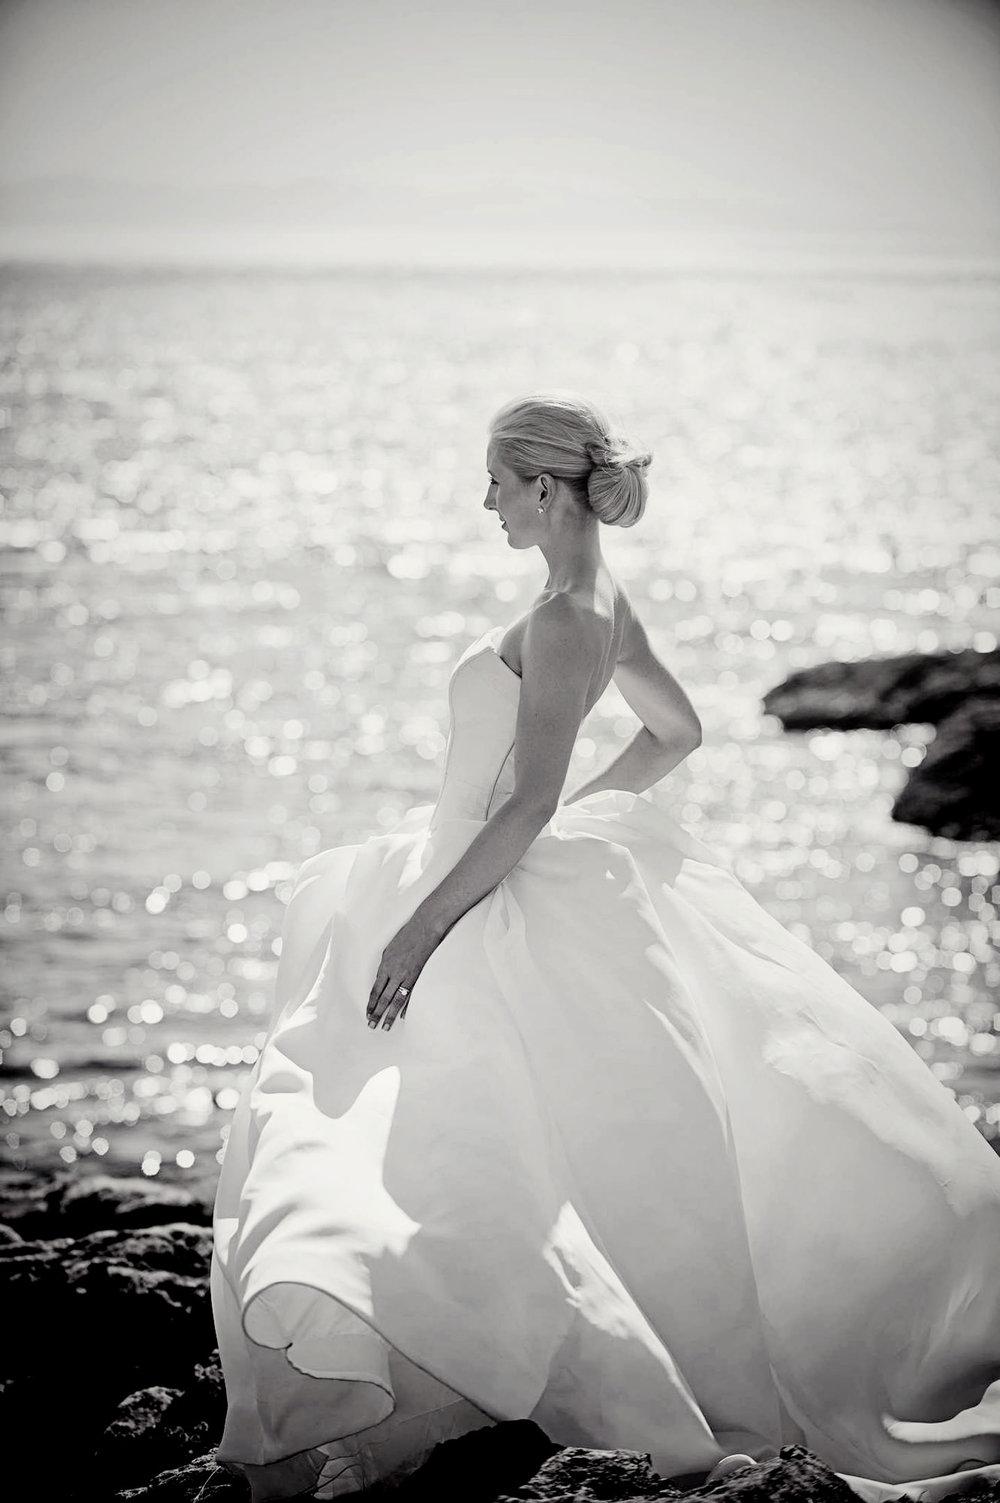 Chris_Hui_婚禮_婚紗照_pre_wedding_photography_best_057_.jpg